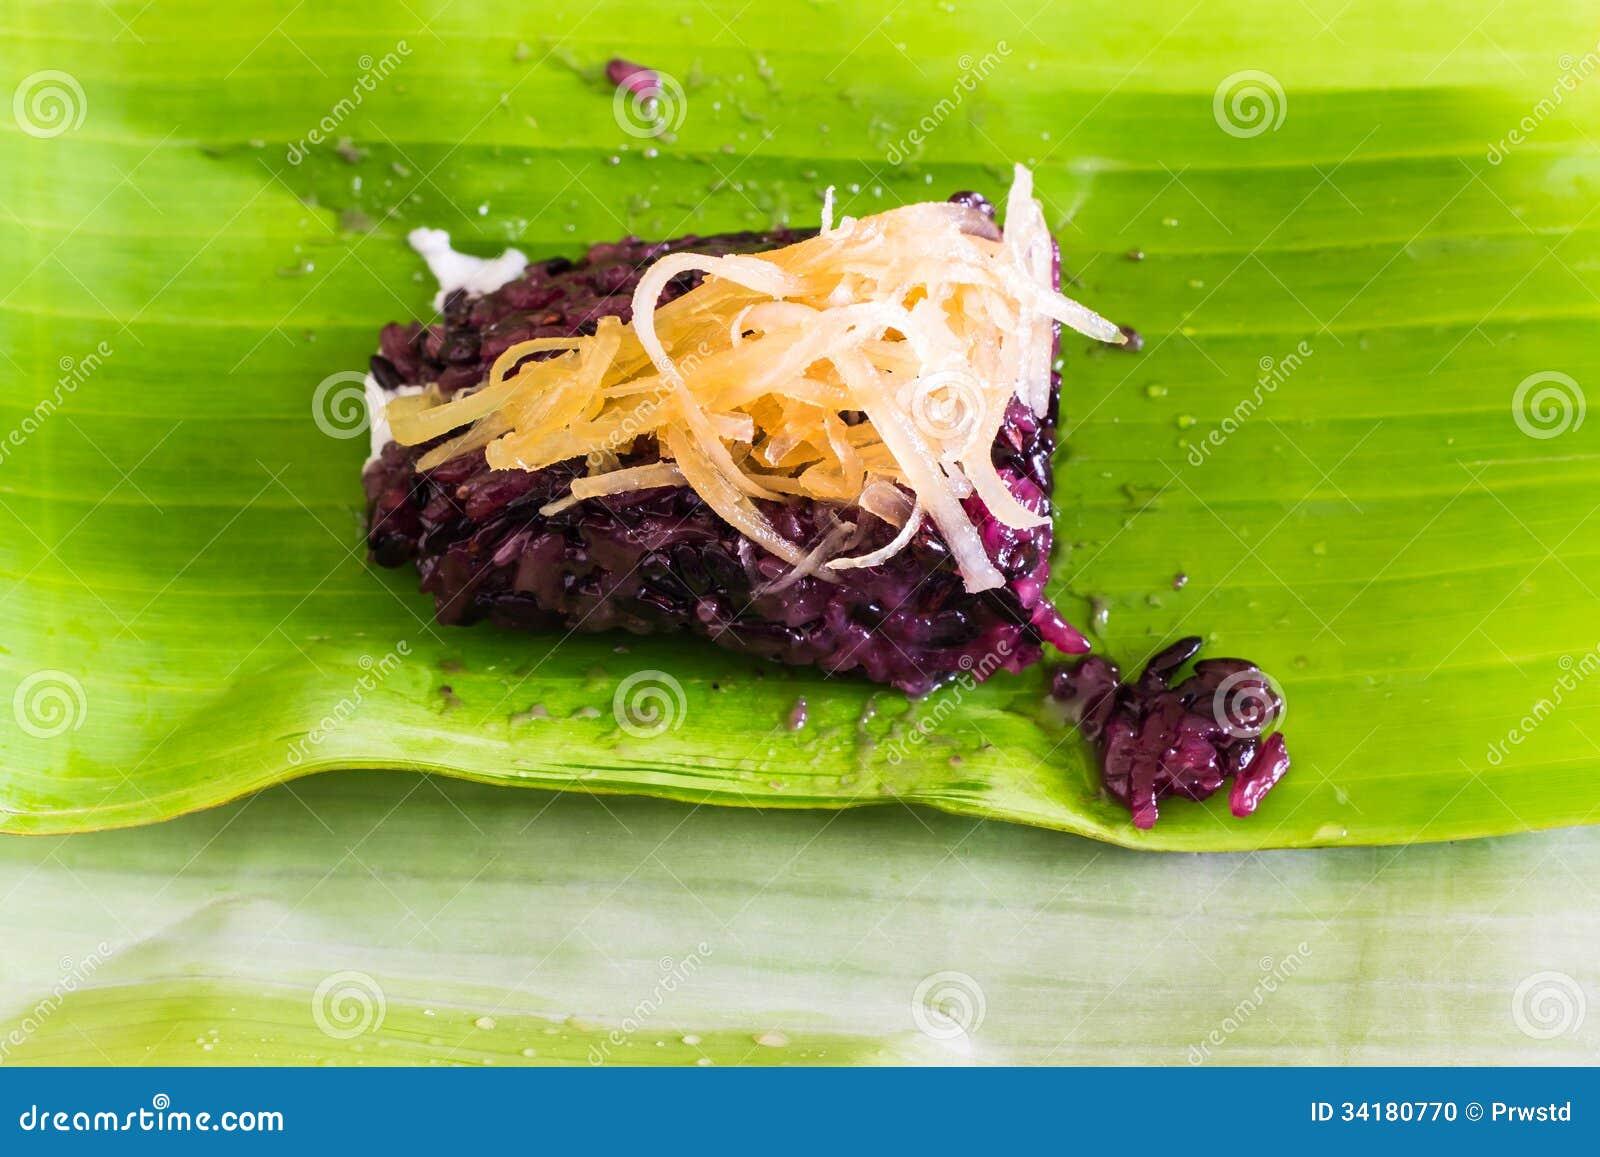 thai style dessert on banana leaf stock photo image. Black Bedroom Furniture Sets. Home Design Ideas